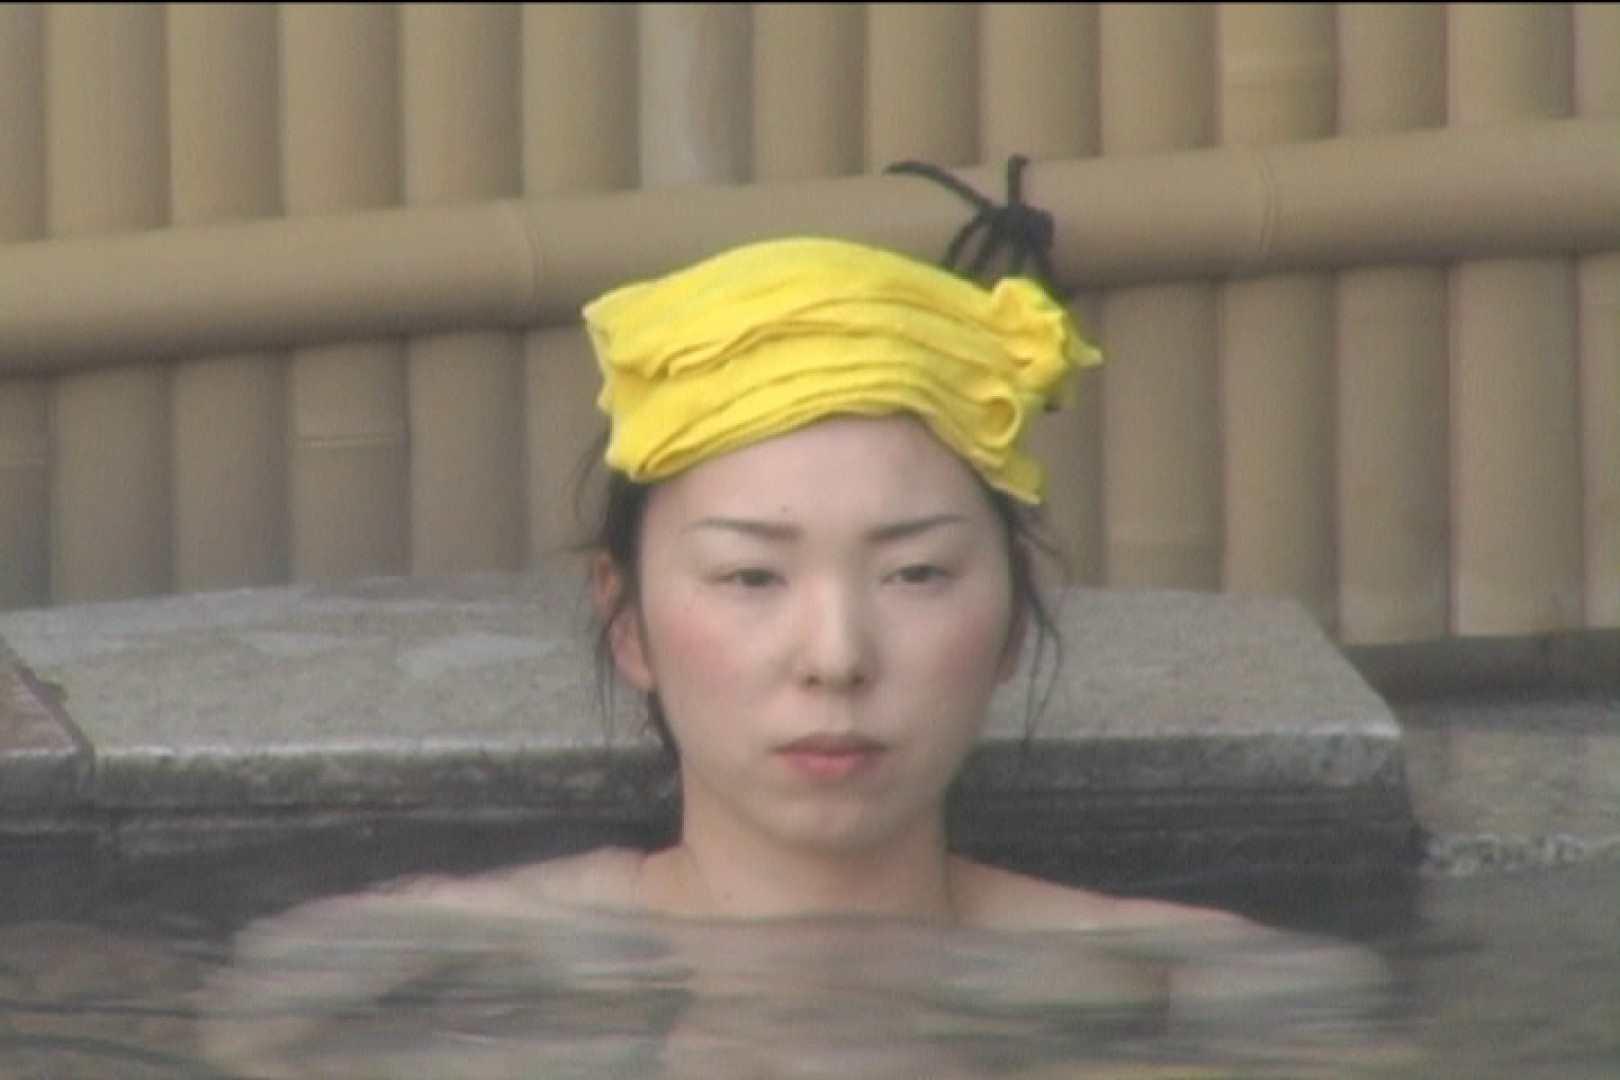 Aquaな露天風呂Vol.529 盗撮シリーズ | 露天風呂編  106PIX 31